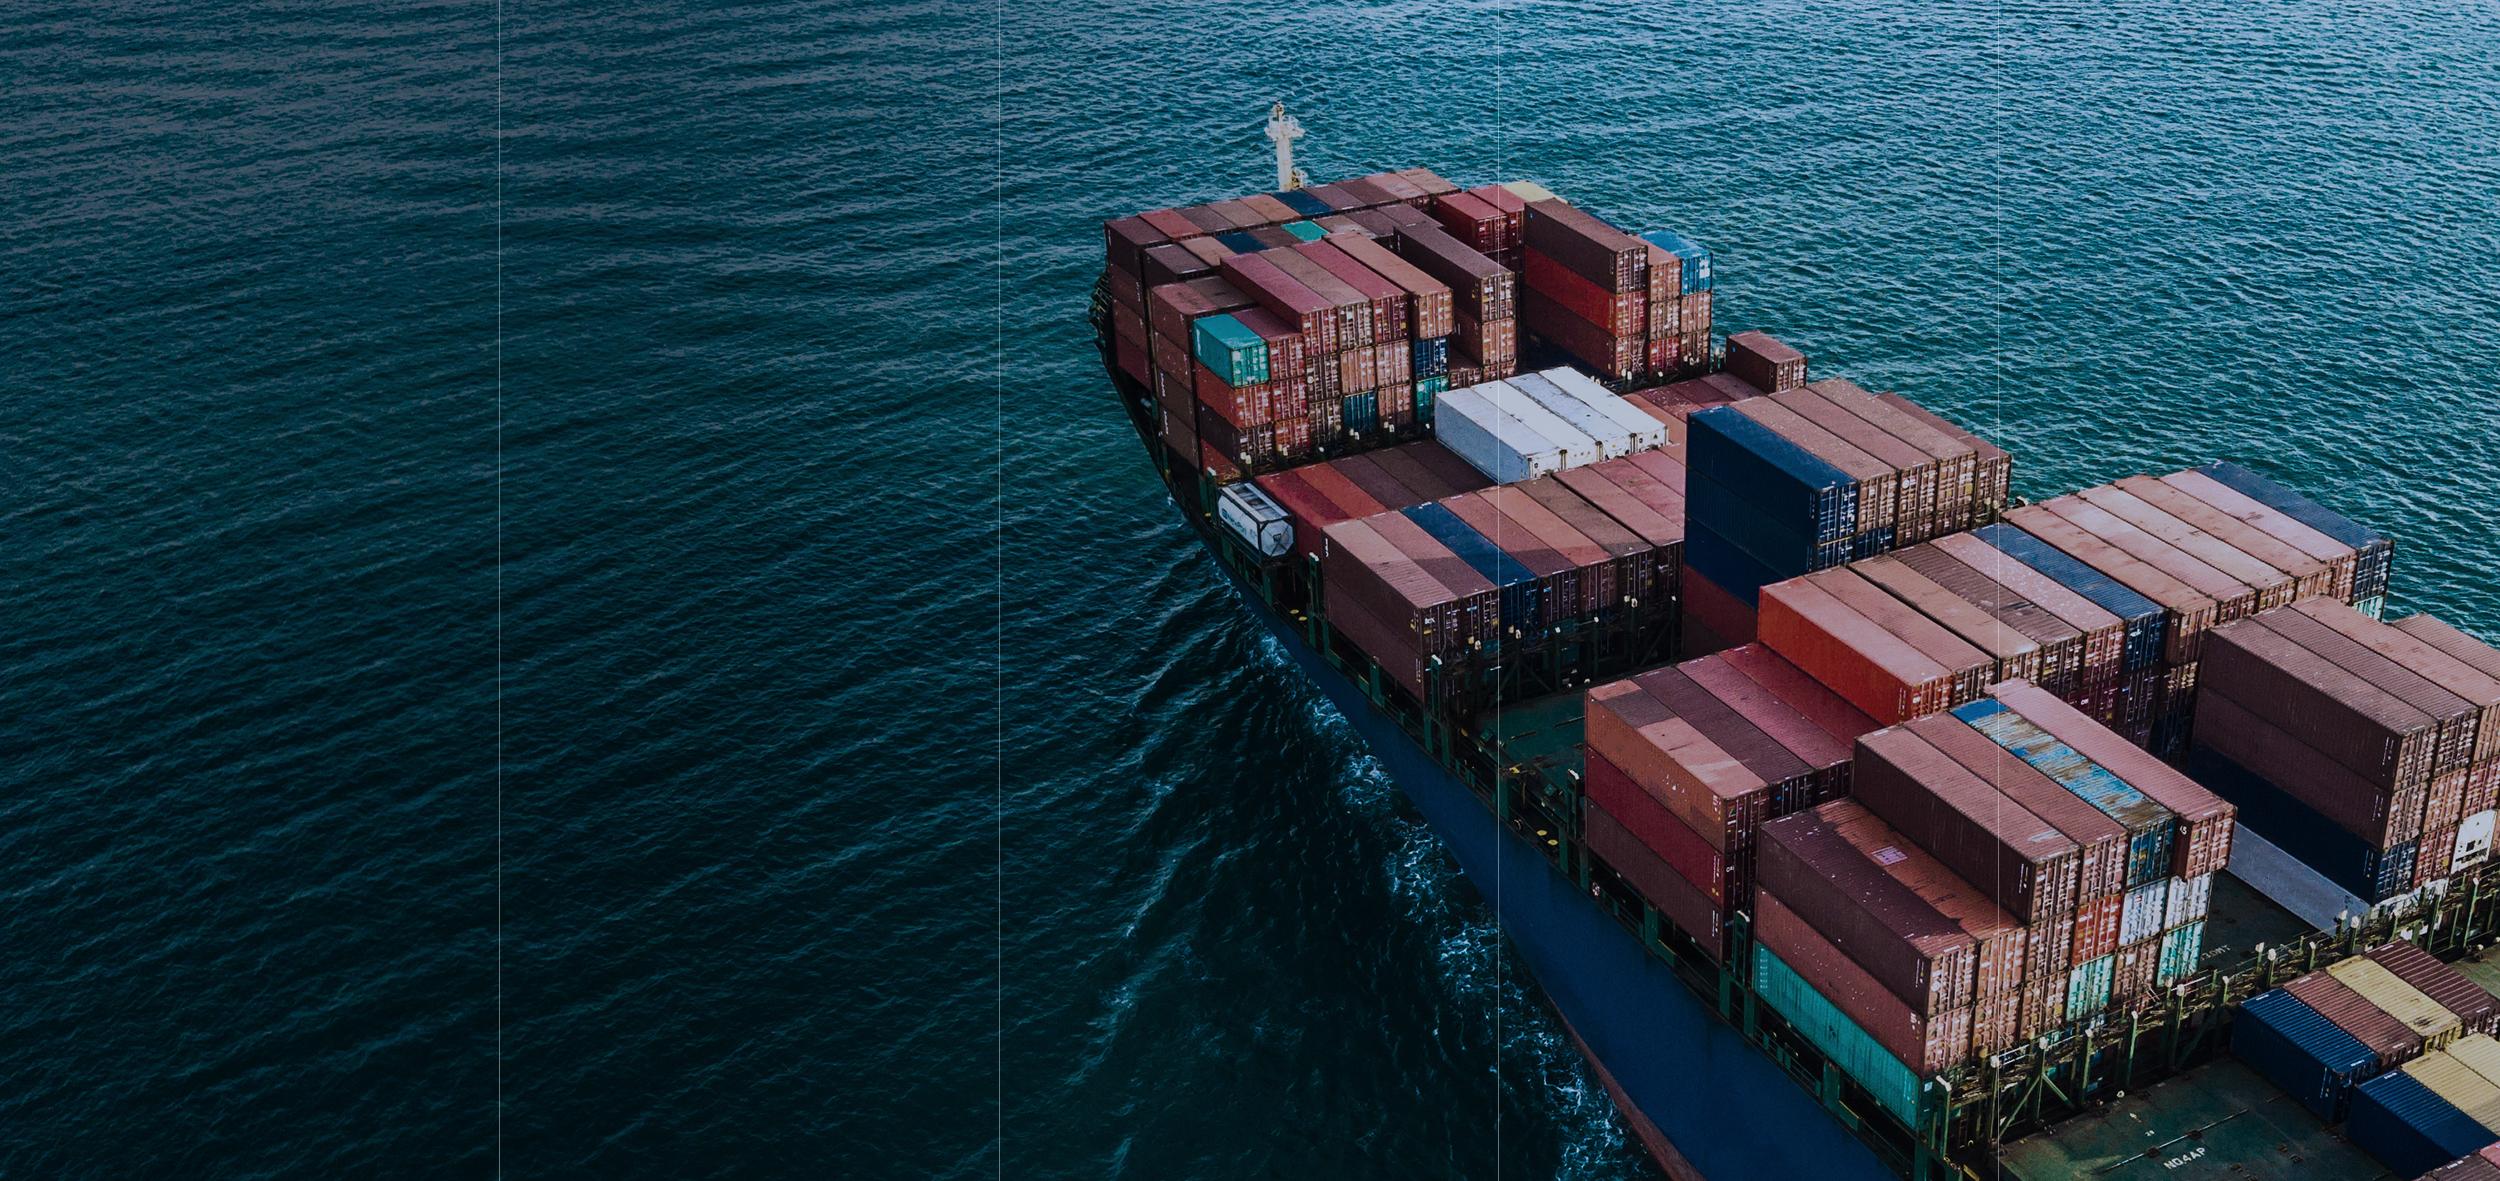 Sea cargo   Ocean freight services   Import   Export   Goods